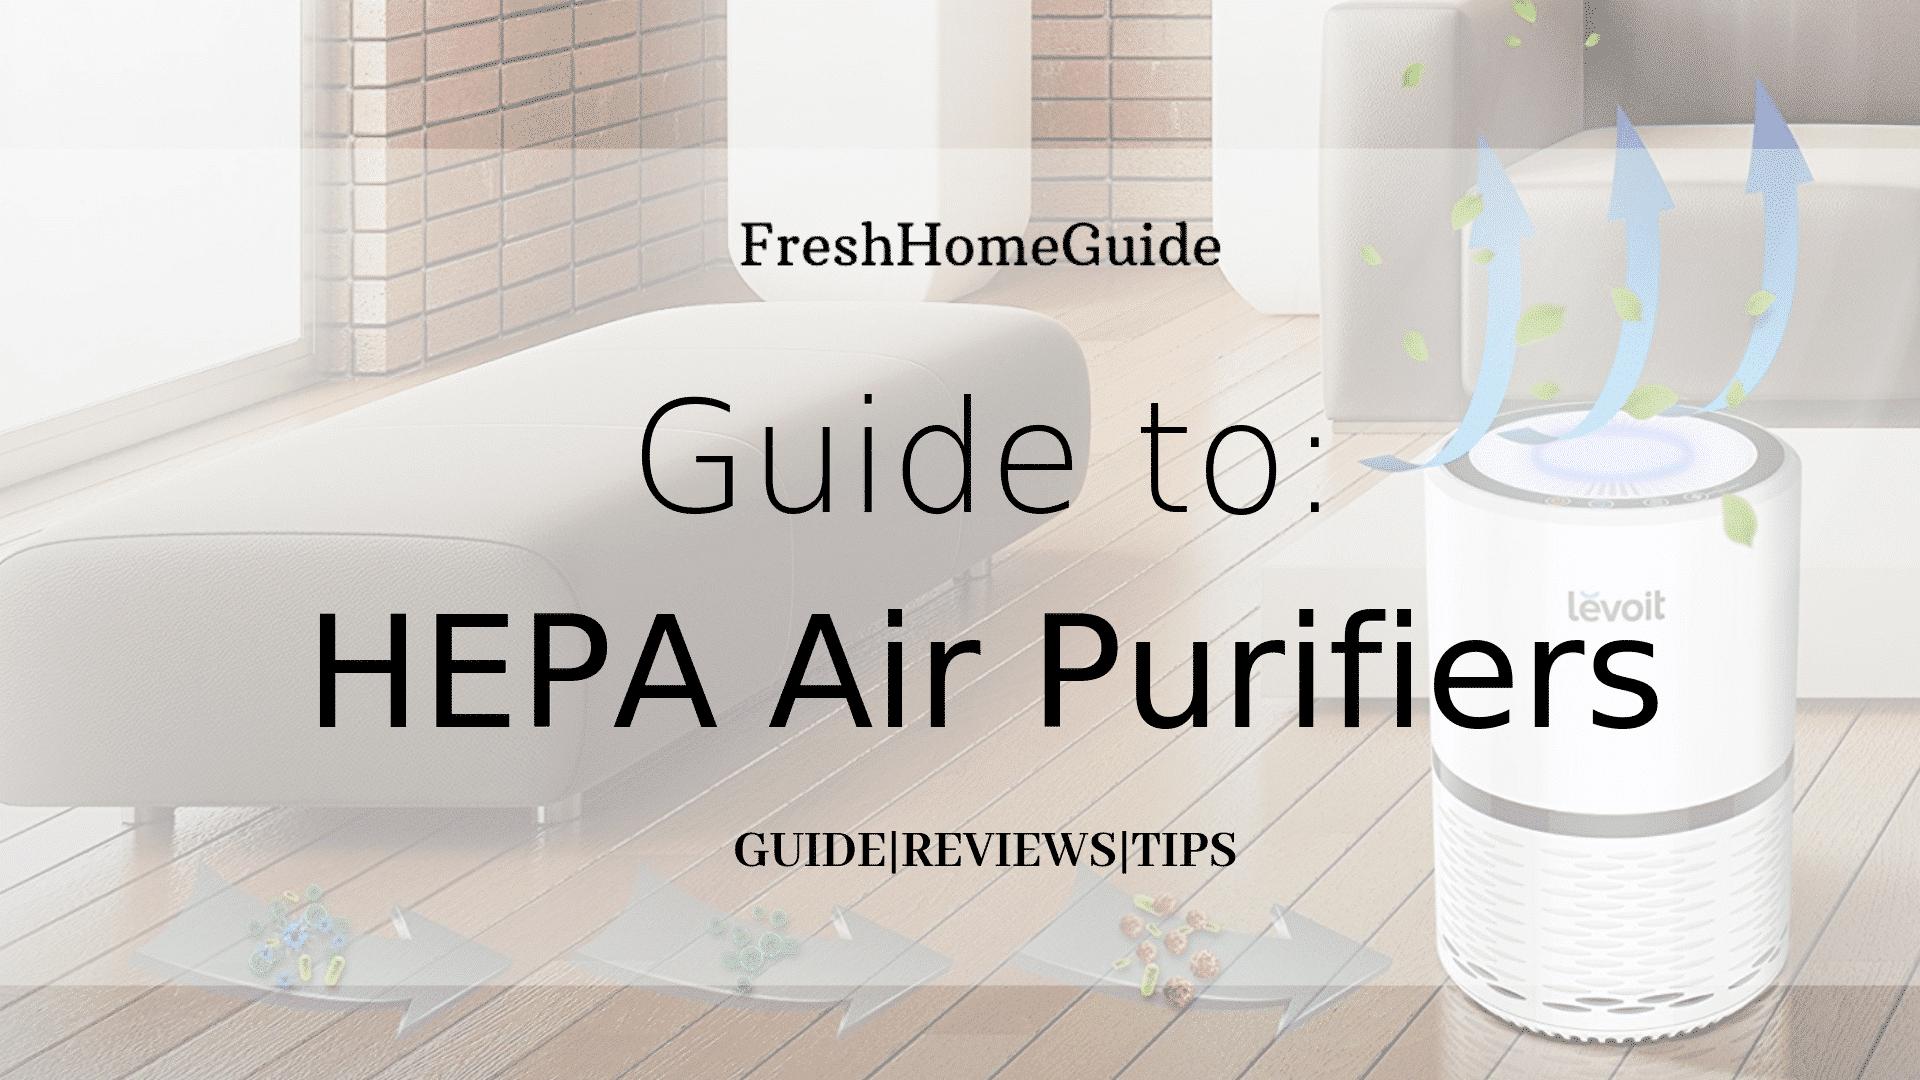 Guide to HEPA Air Purifiers